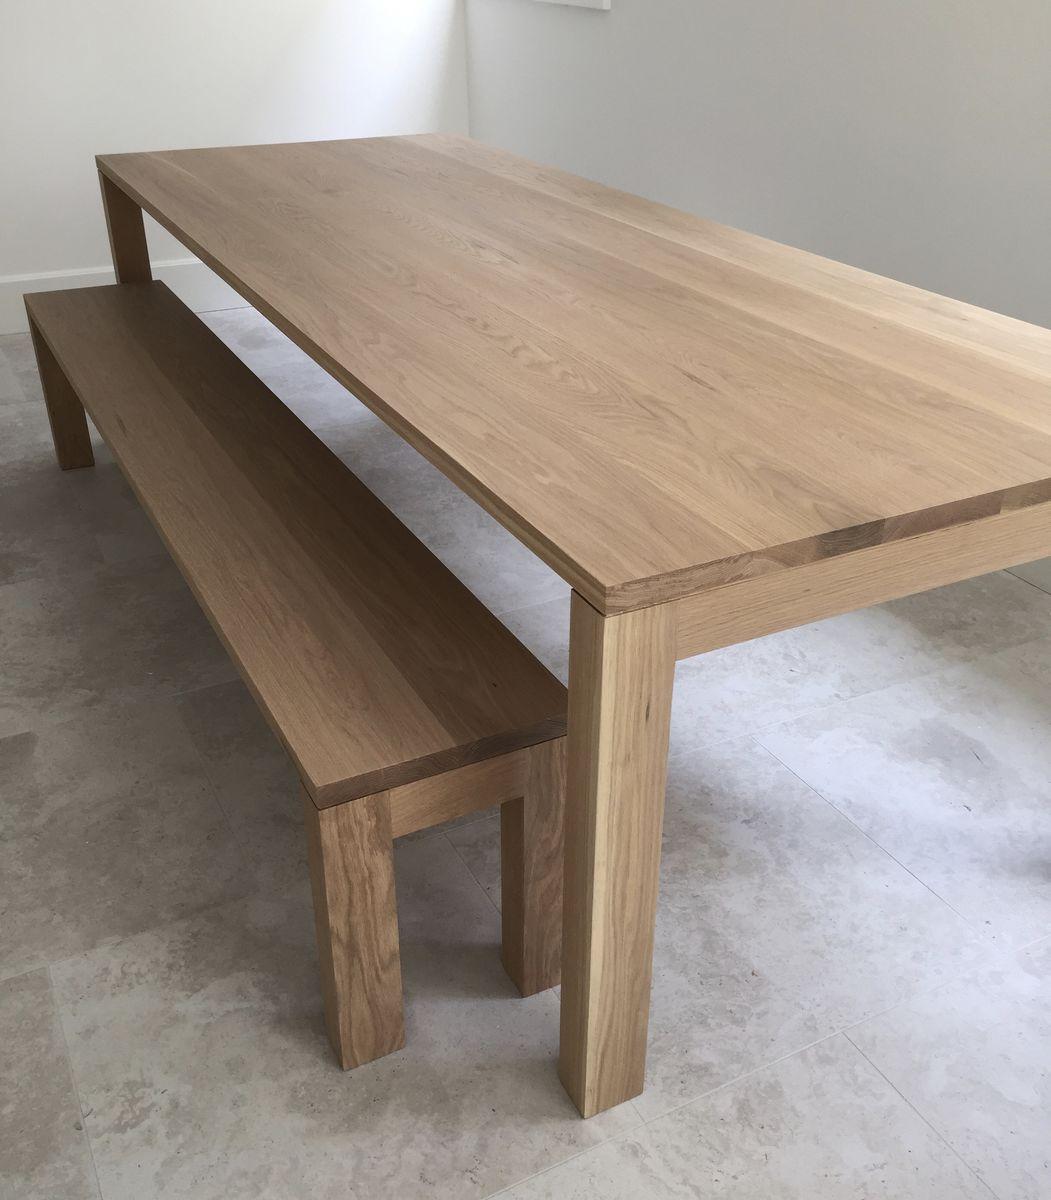 Slimline Oak Table   Product Images Of ...